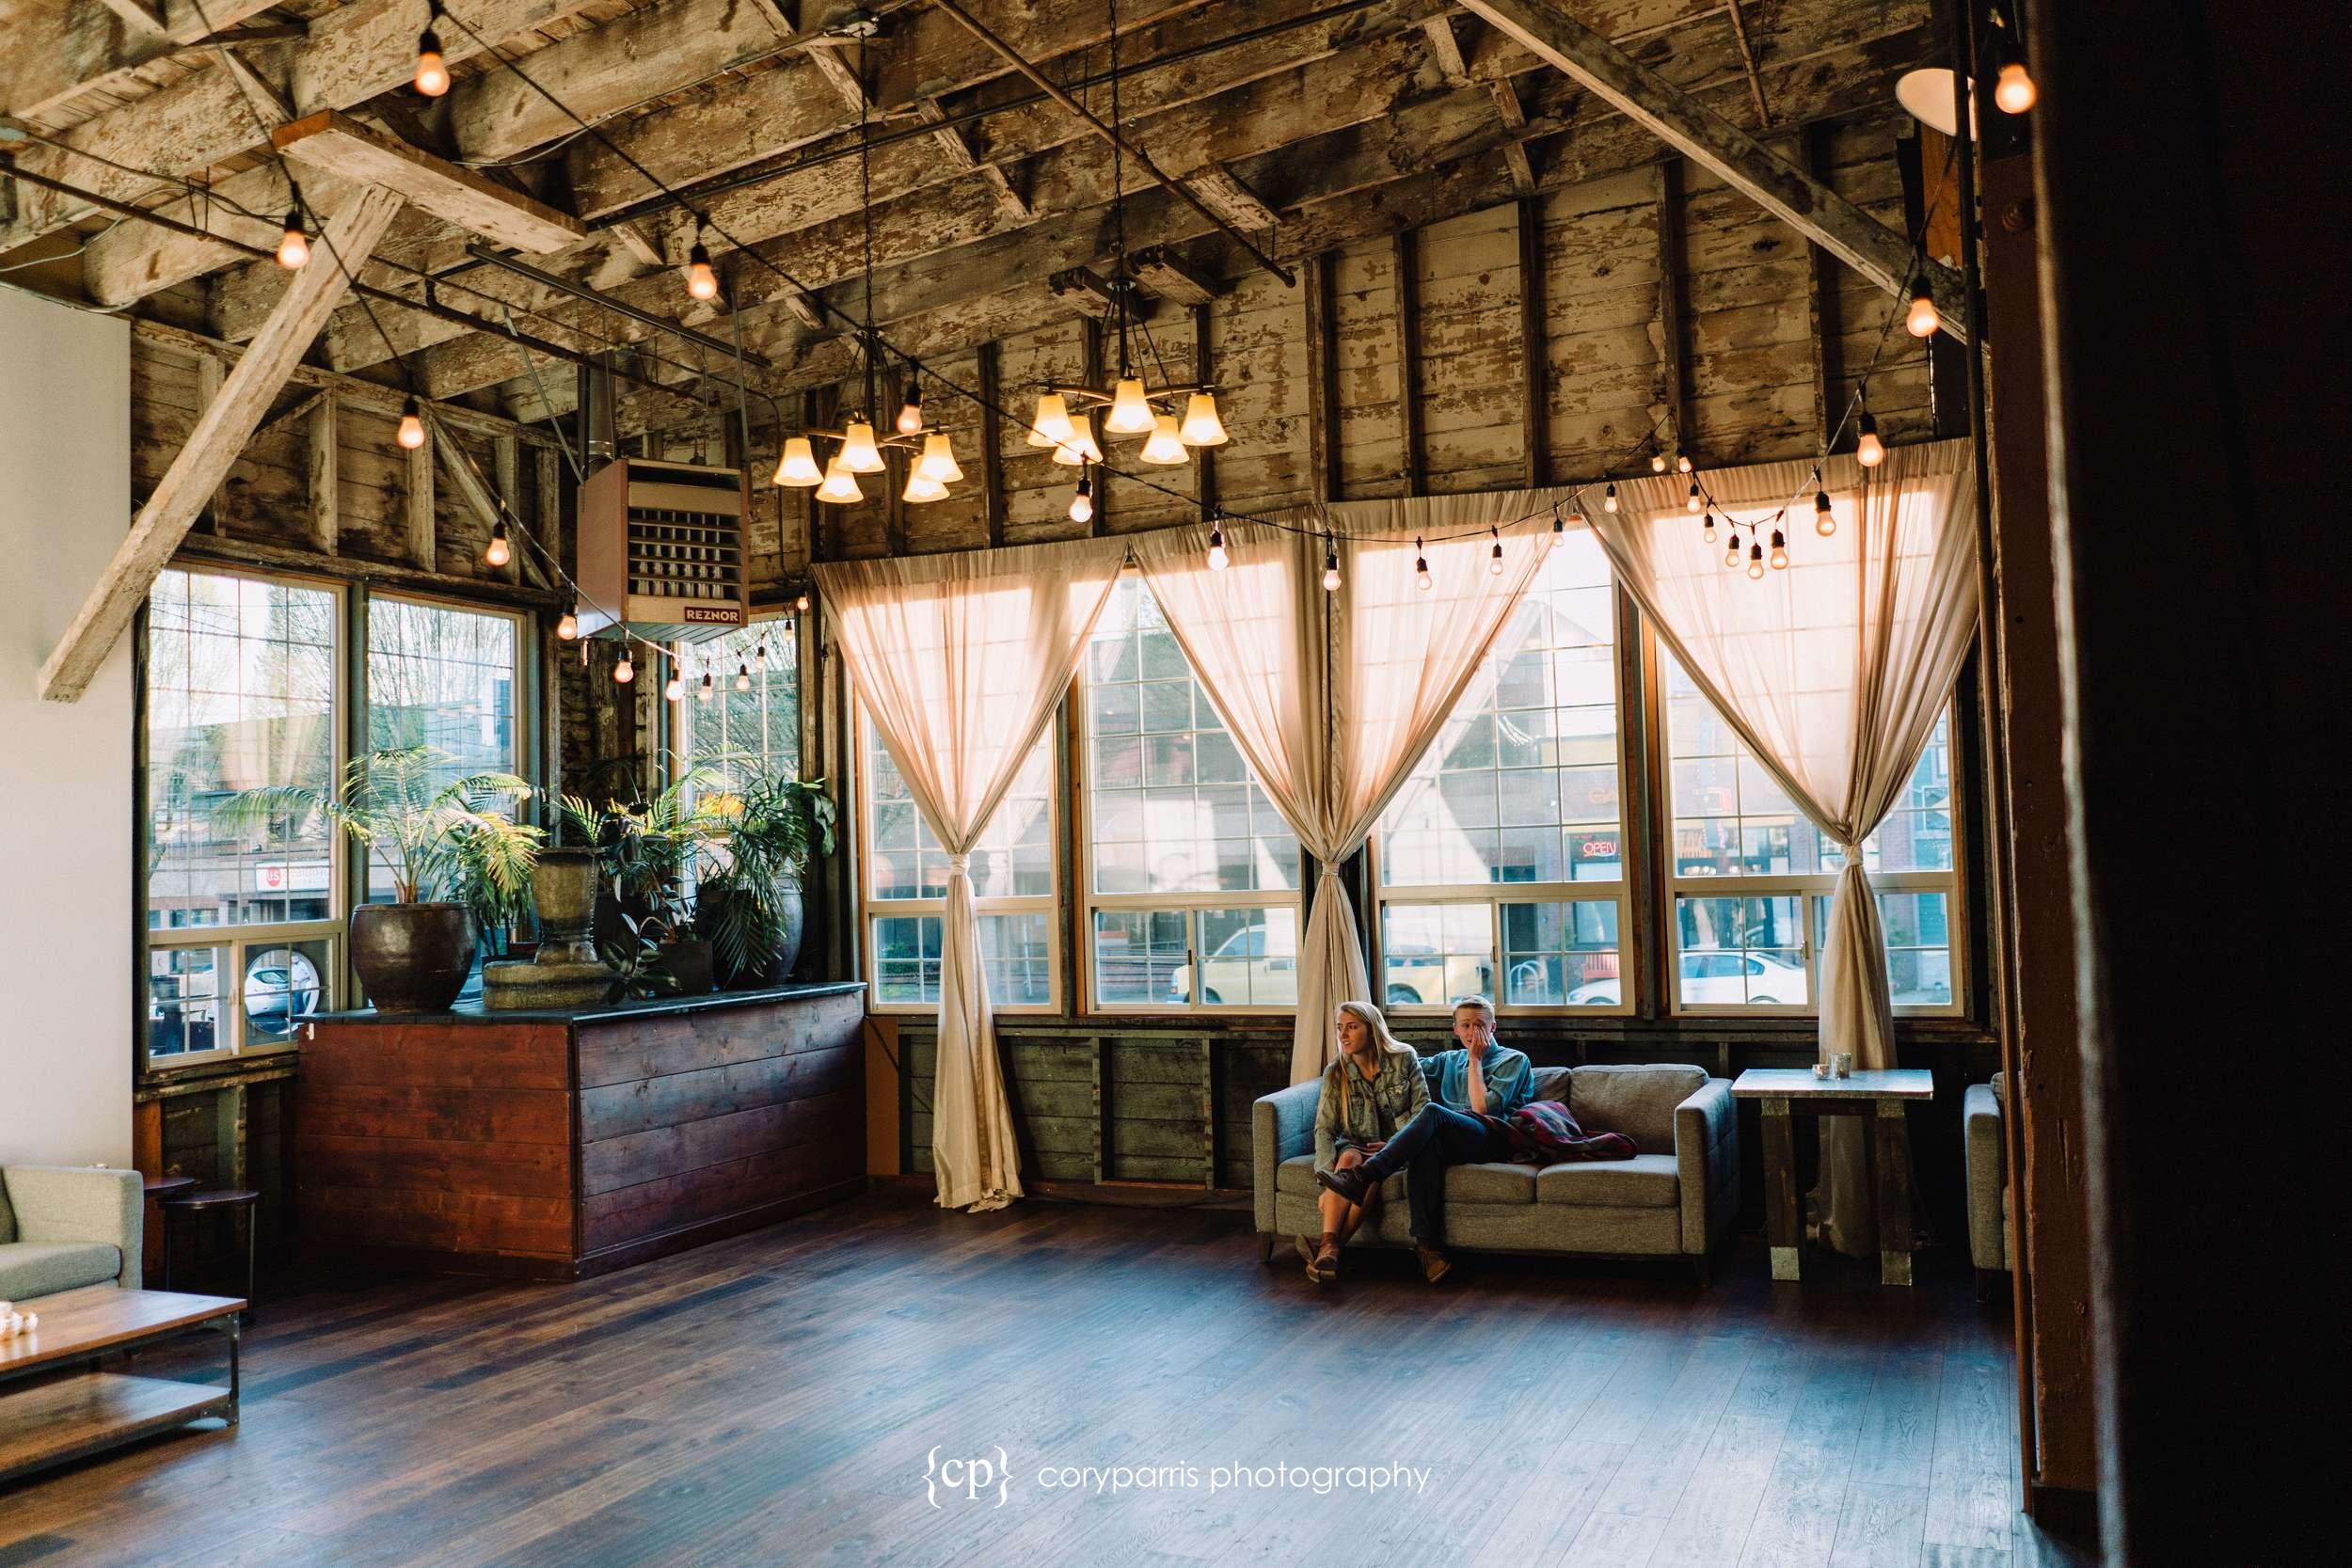 033-SODO-Park-wedding-venue-seattle.jpg